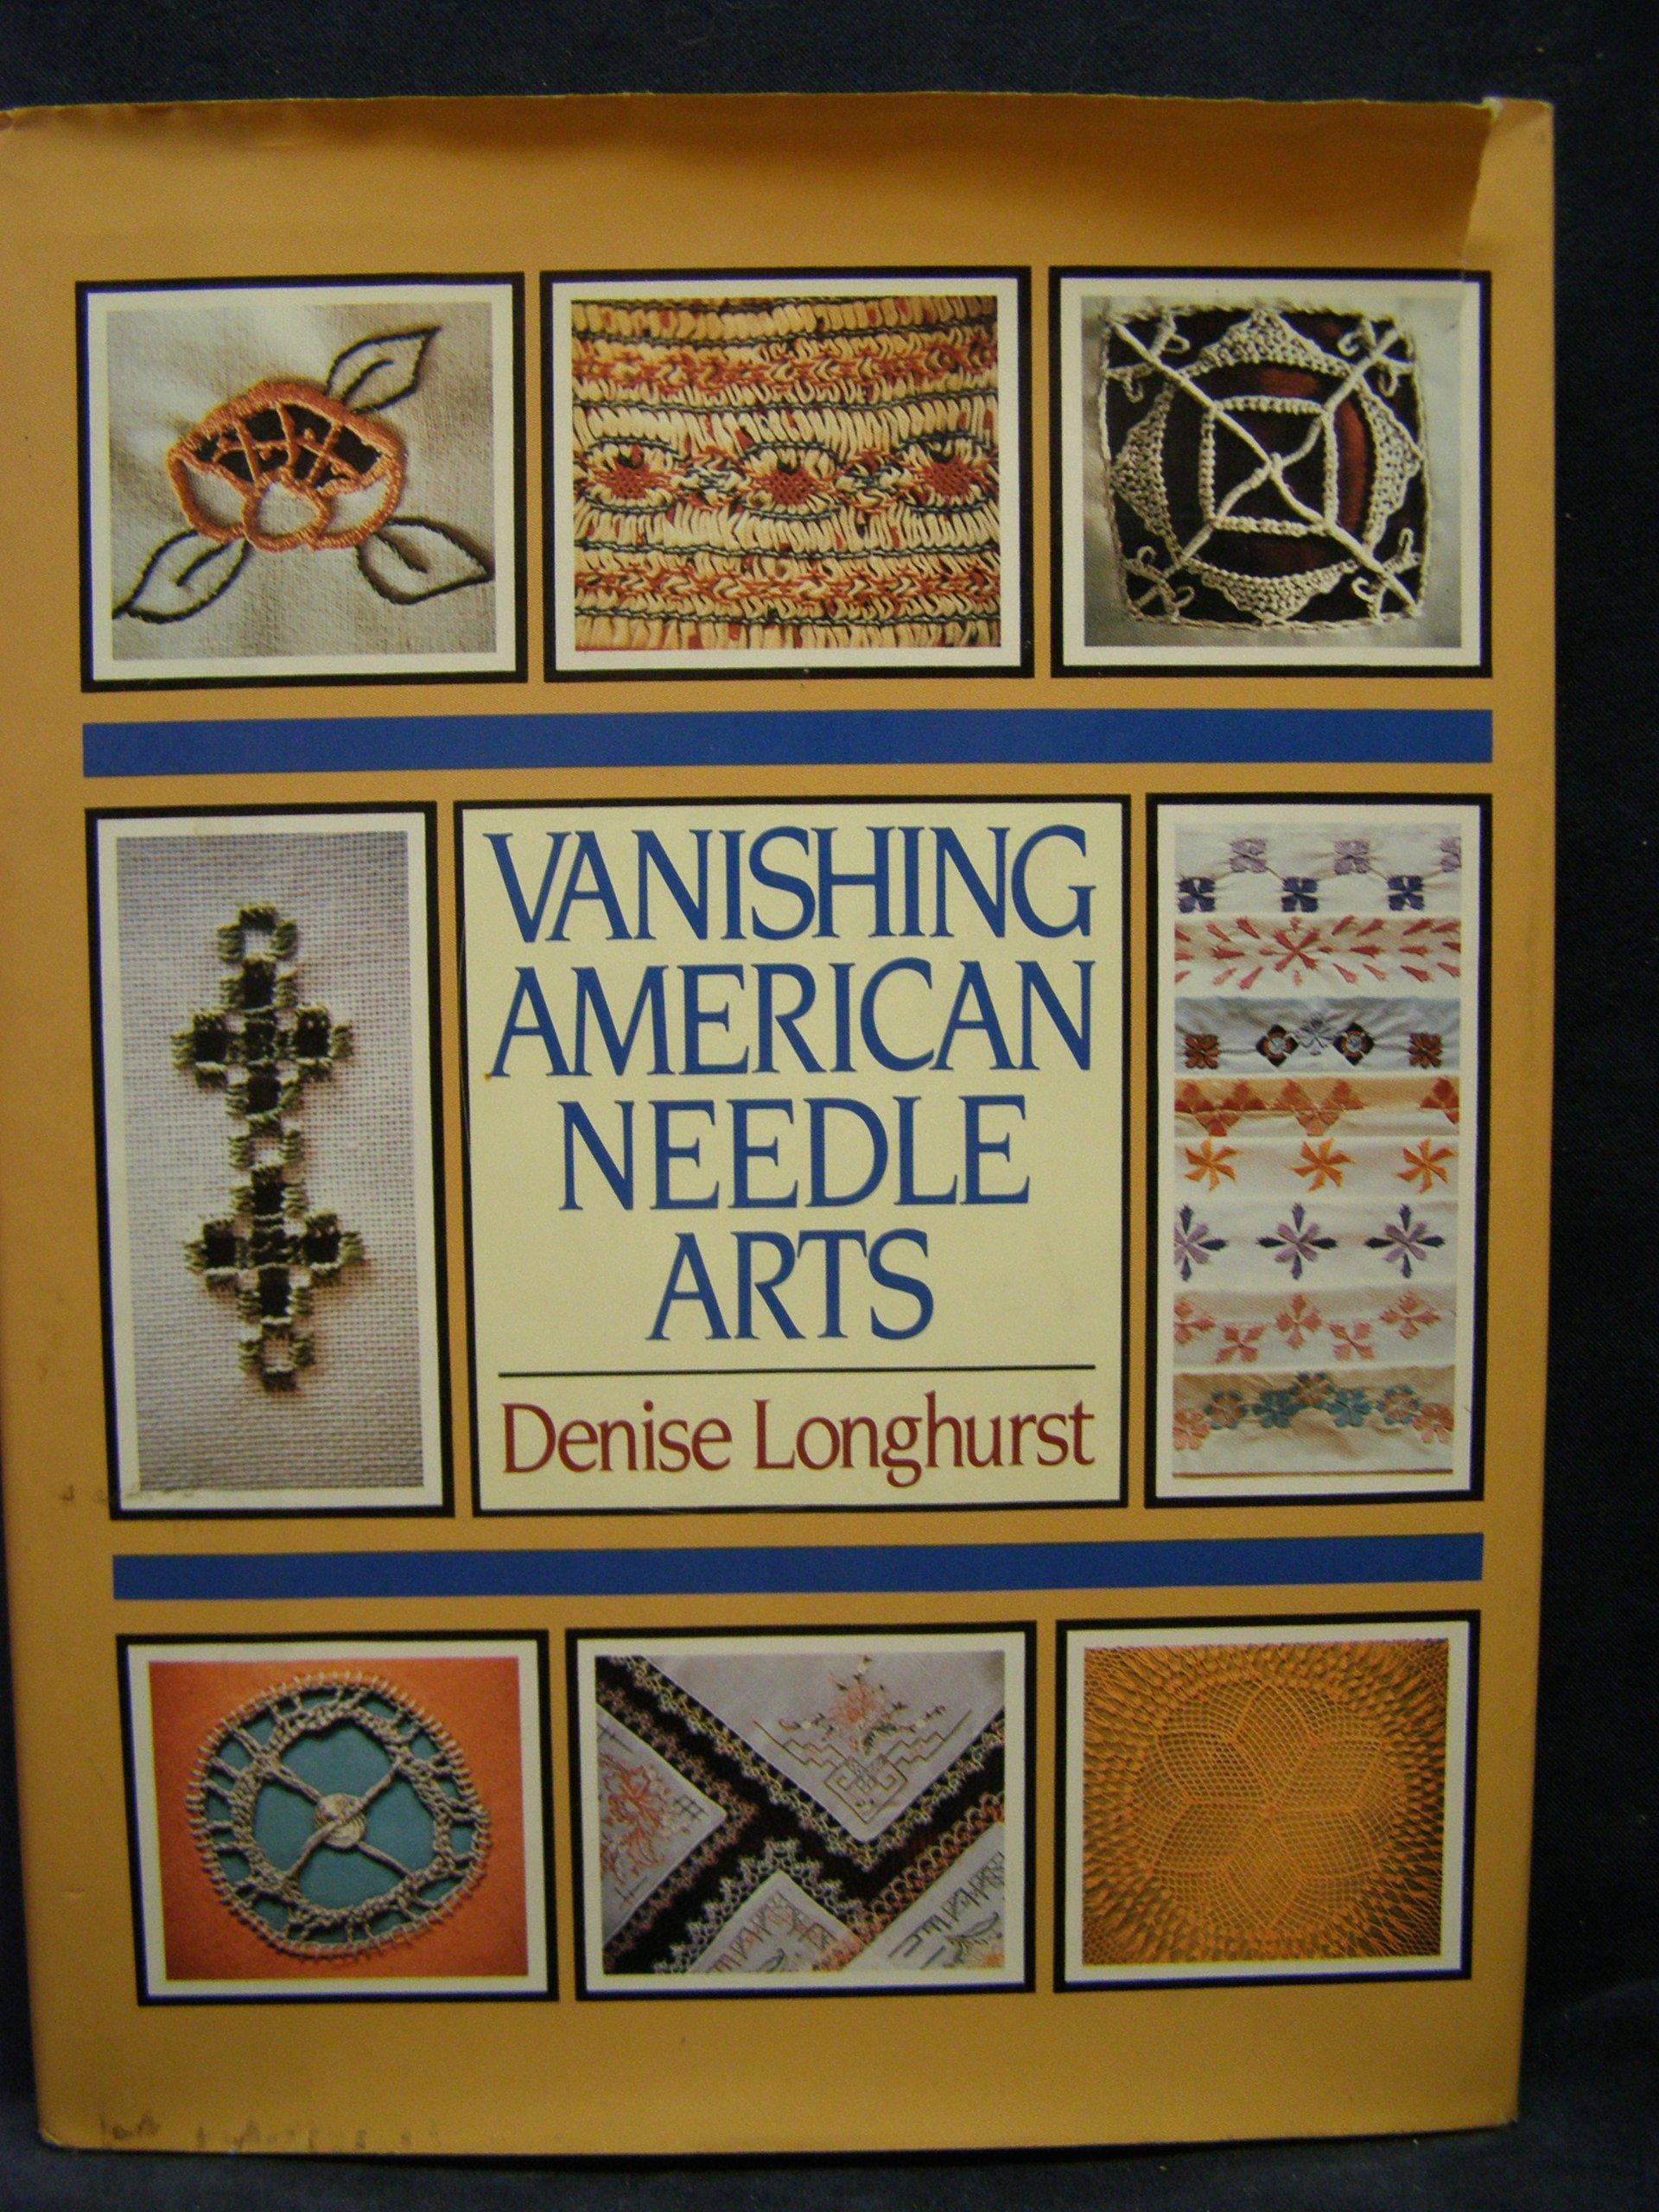 Vanishing American Needle Arts: Denise Longhurst